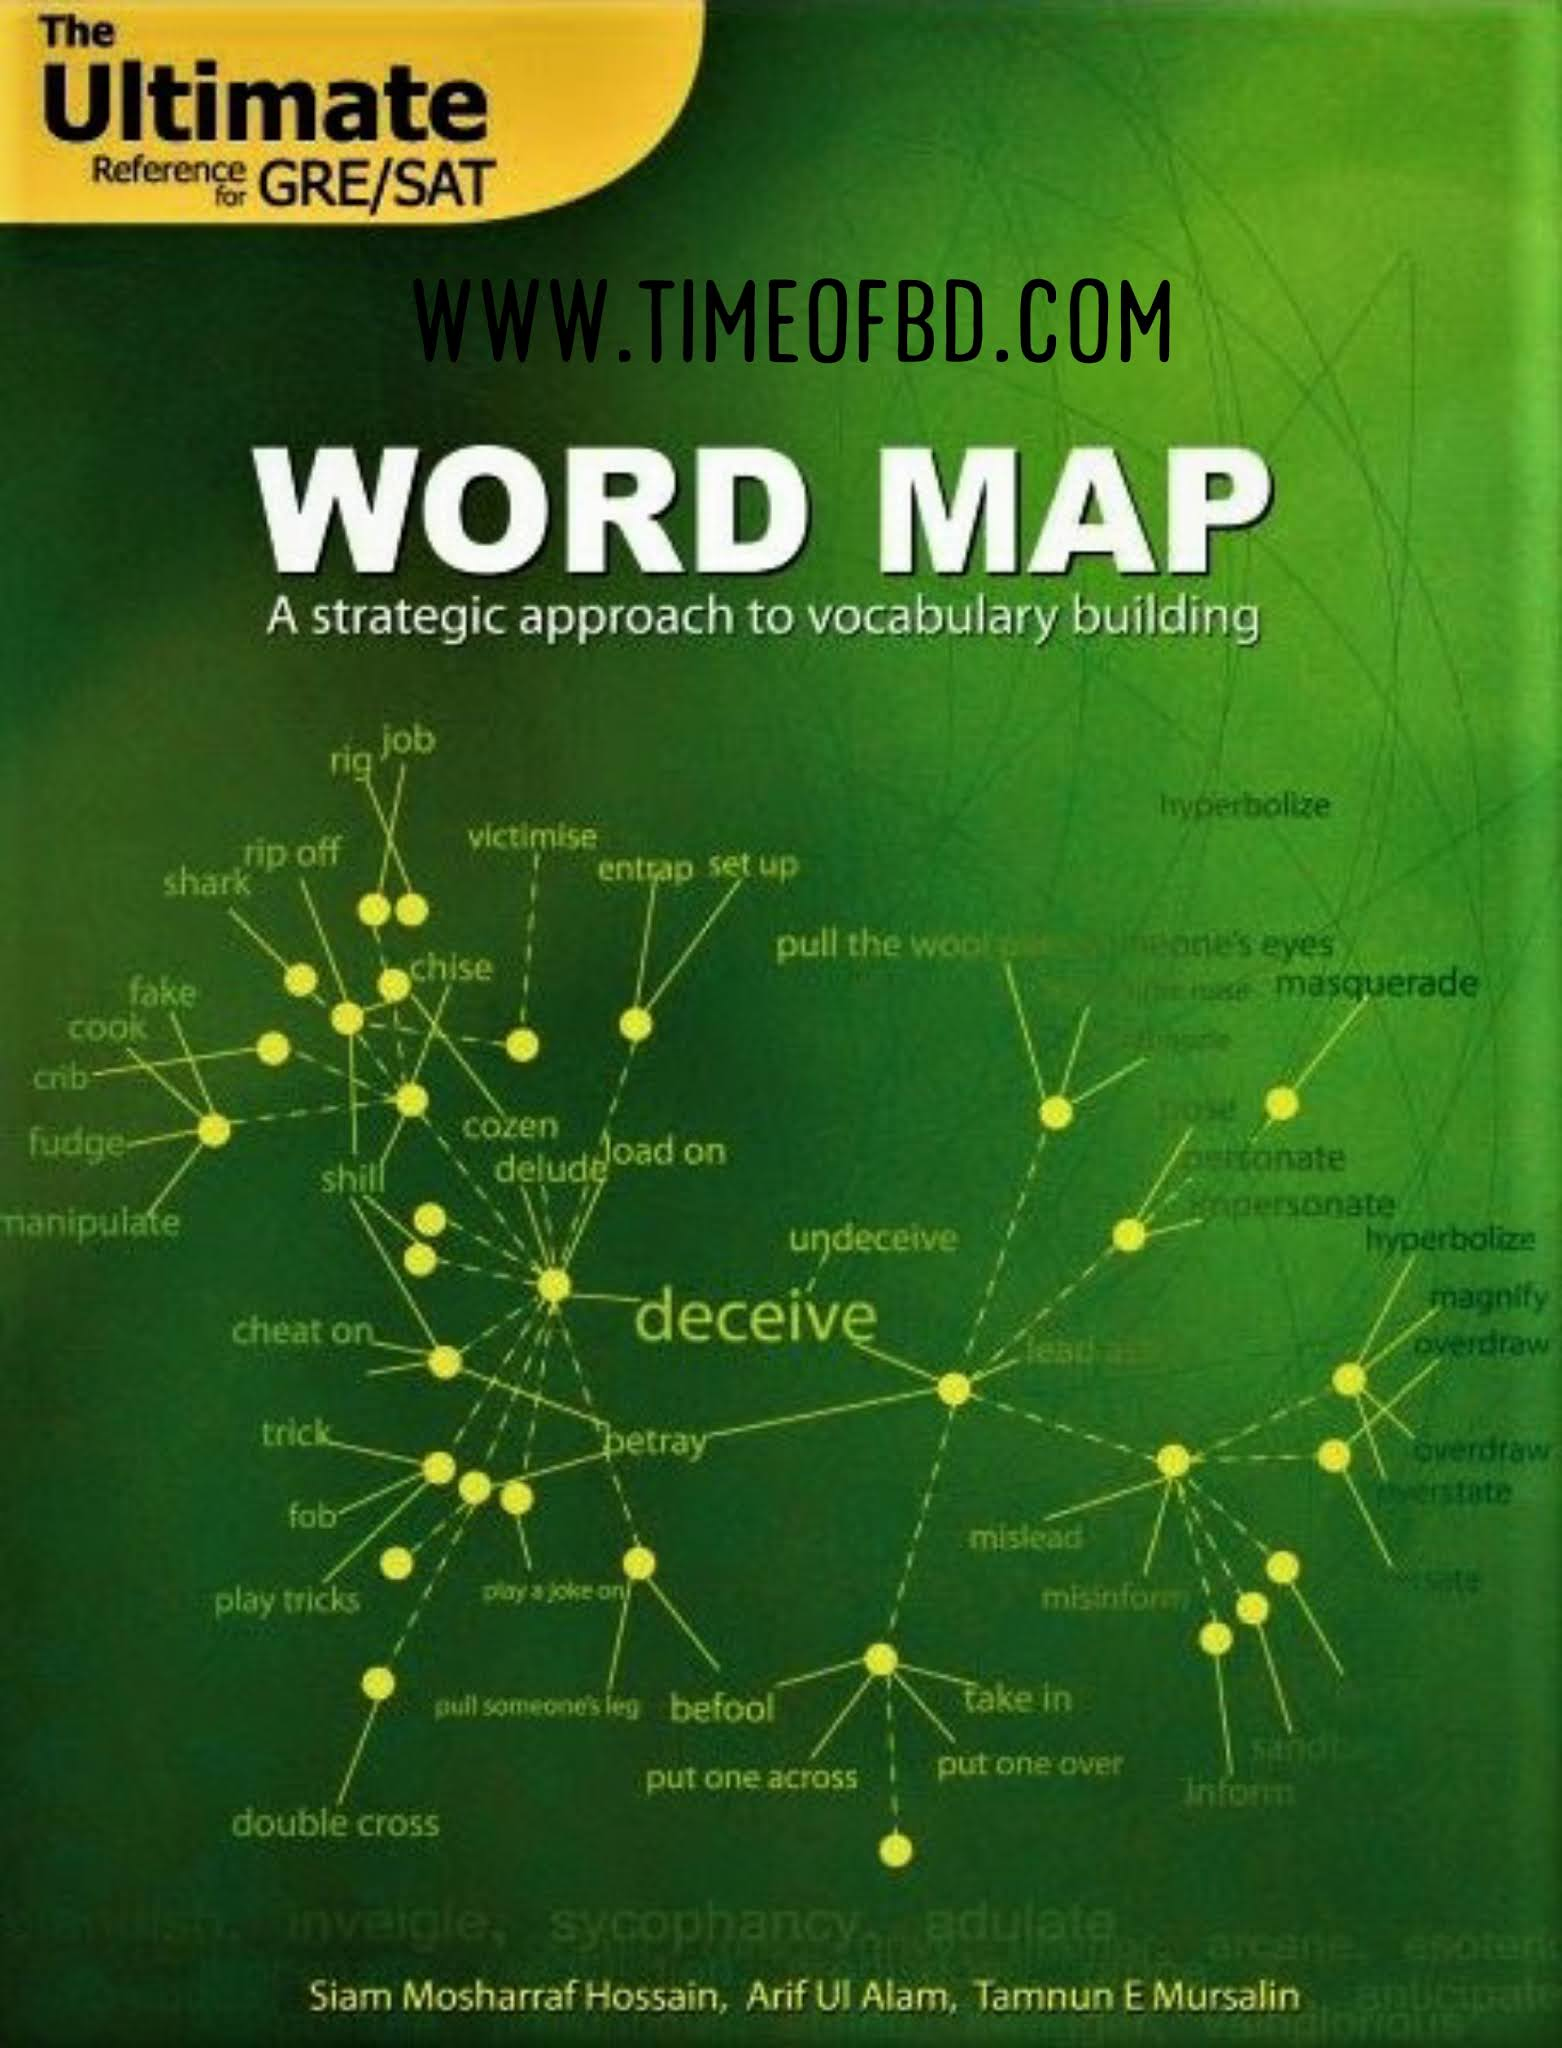 Word map book। ওয়ার্ড ম্যাপ বুক